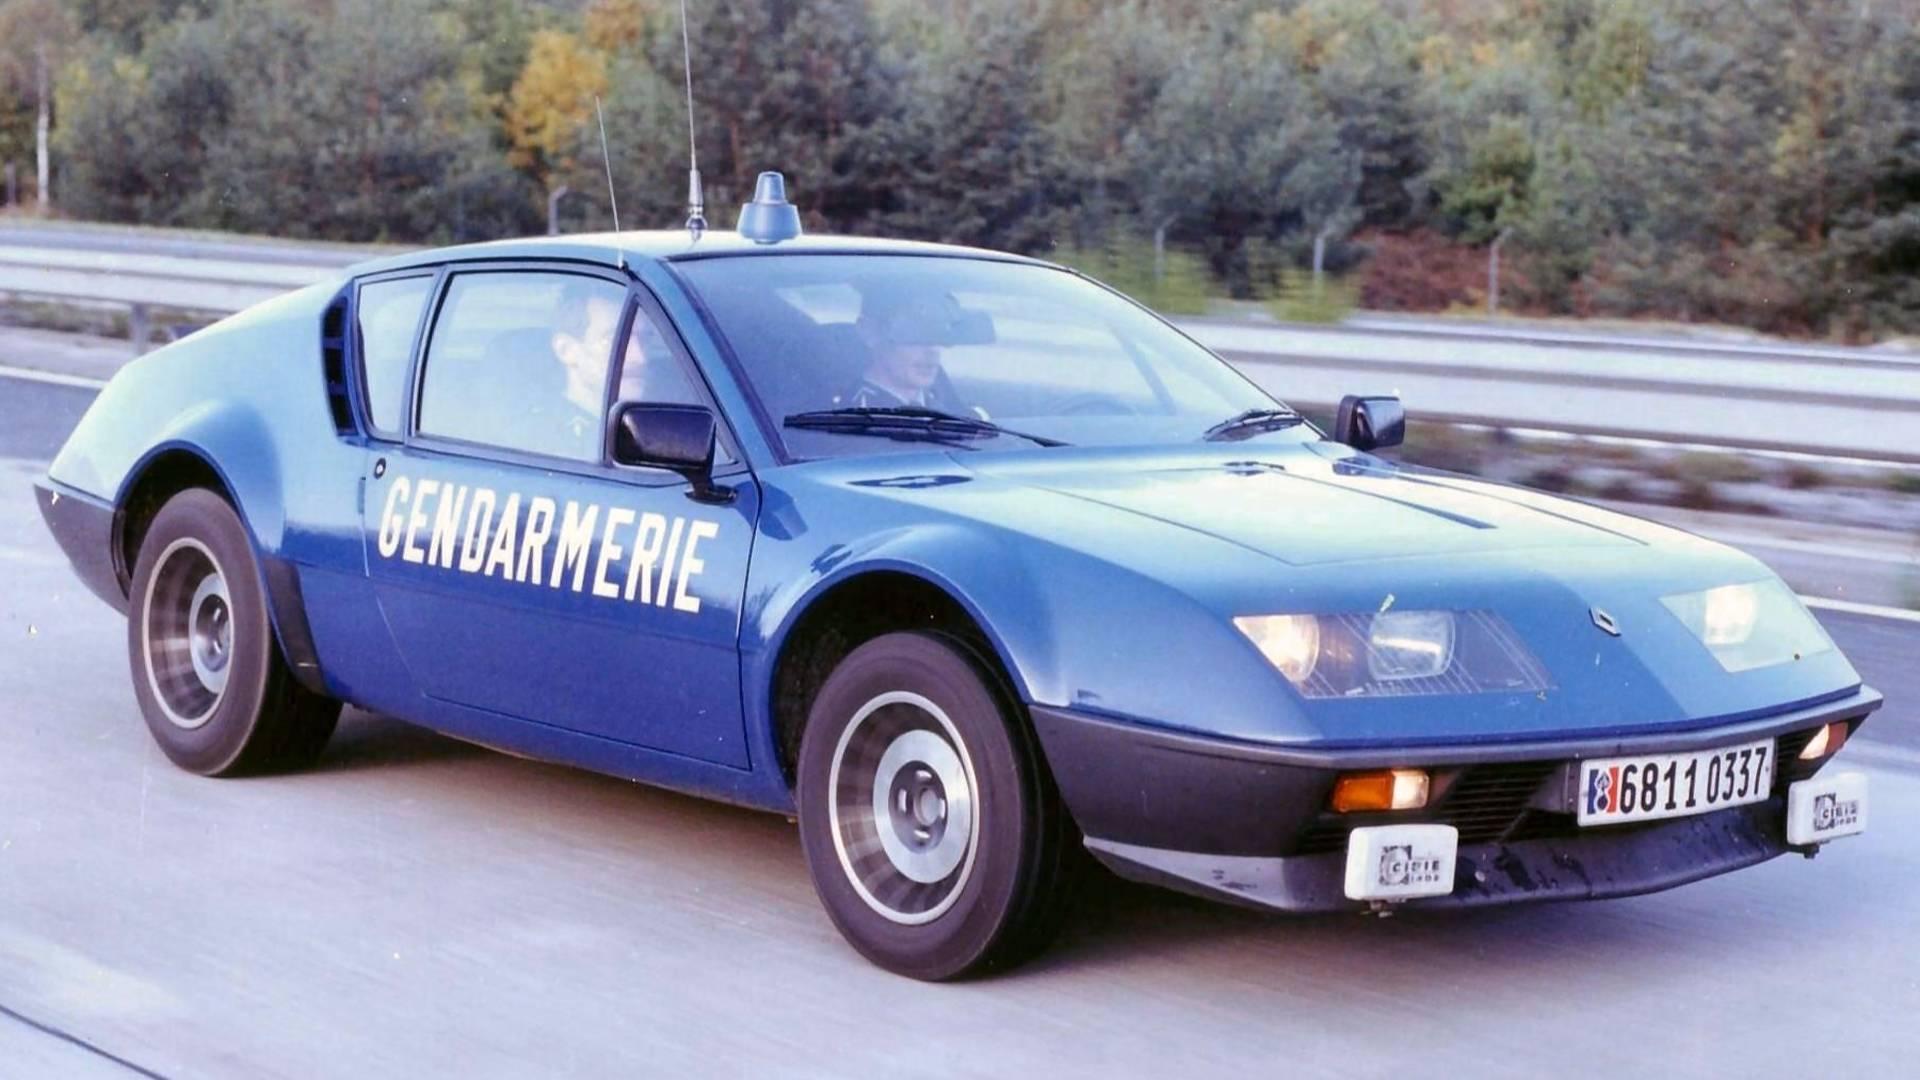 http://cdn.motor1.com/images/mgl/VEEJz/s1/alpine-gendarmerie.jpg